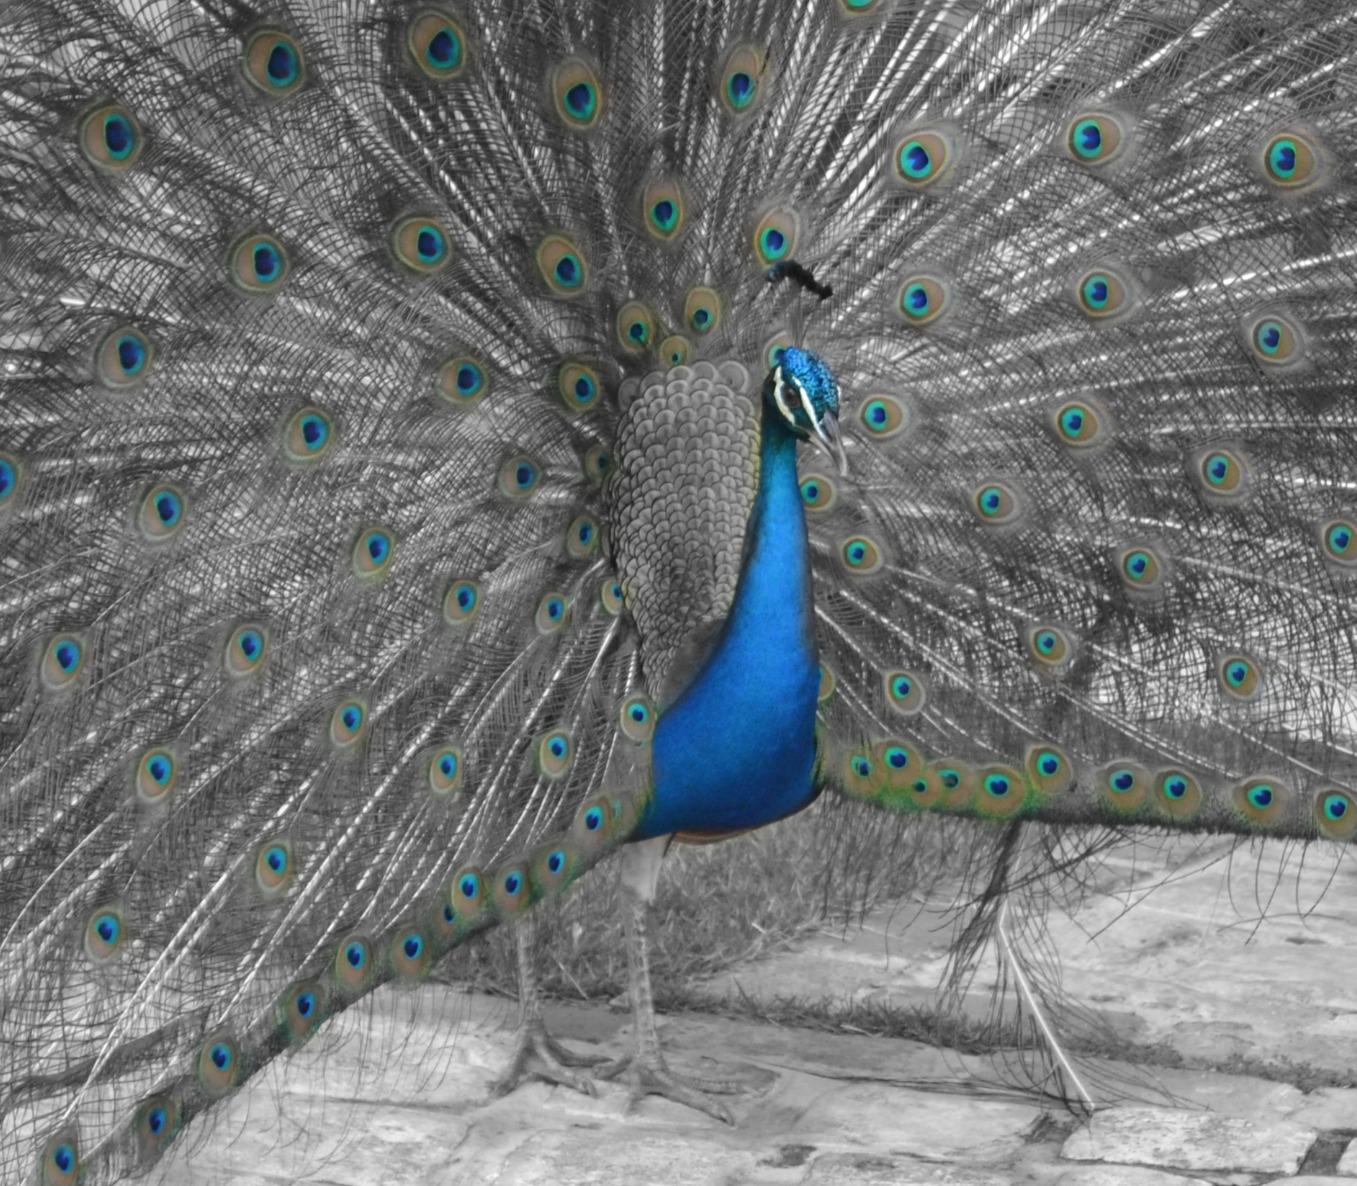 Male Peacock, Punta Cana